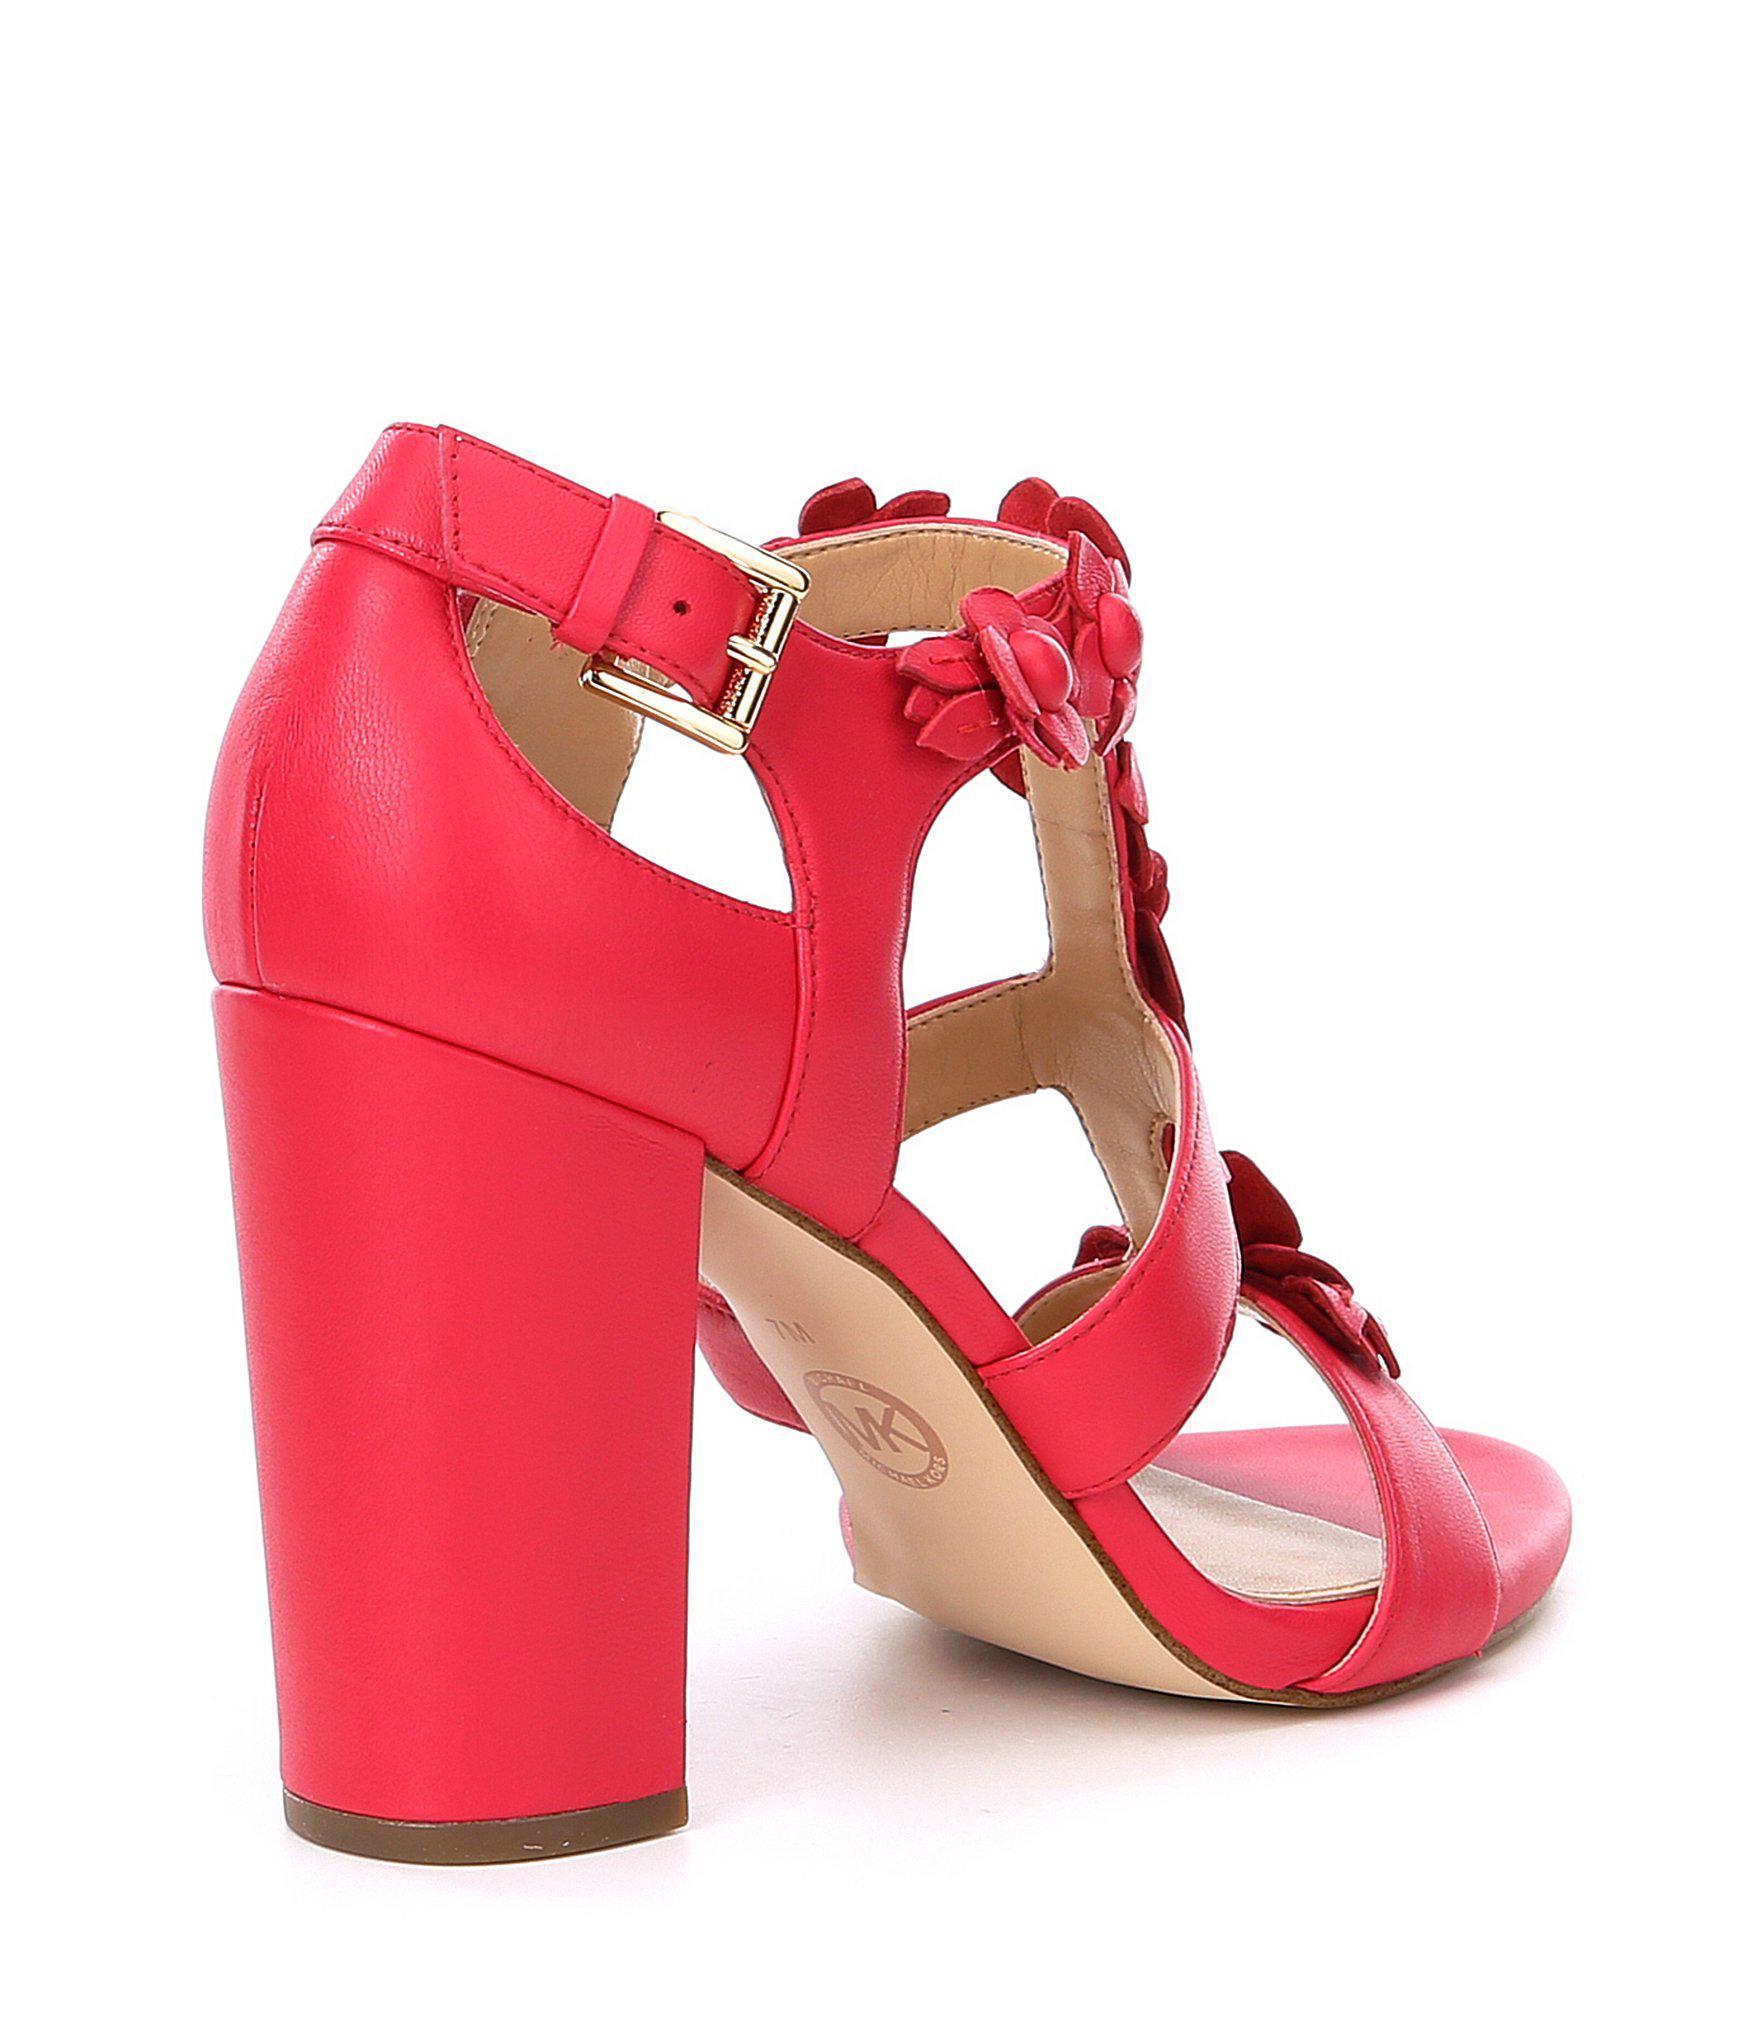 15ac482d3d5 Details about Michael Michael Kors Womens Tricia T-Strap Leather Open Toe,  Deep Pink, Size 7.0